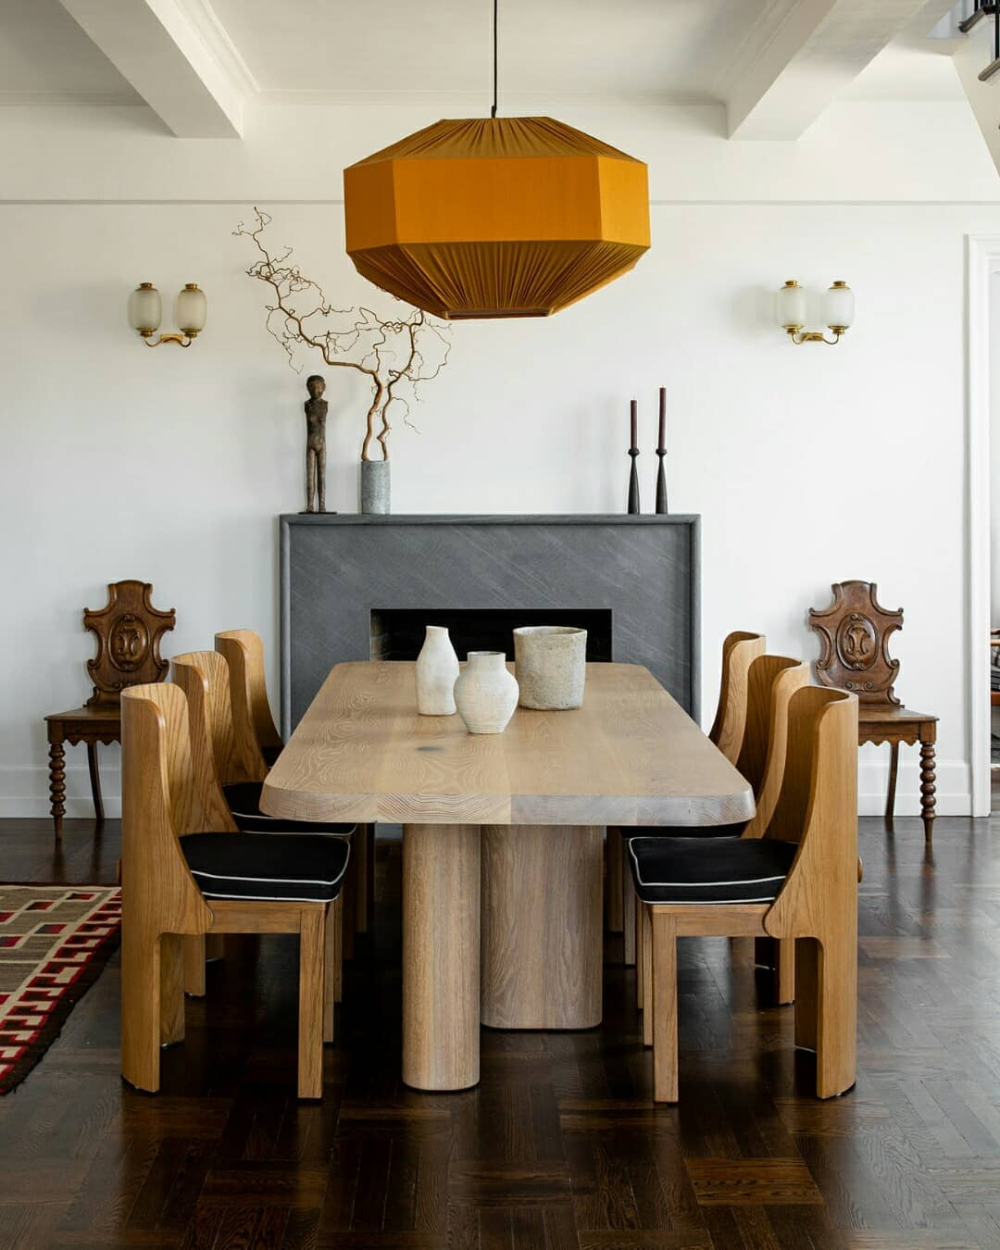 Estliving Com Est Living Instagram Photos And Videos In 2020 Dining Room Inspiration Interior Dining Room Decor